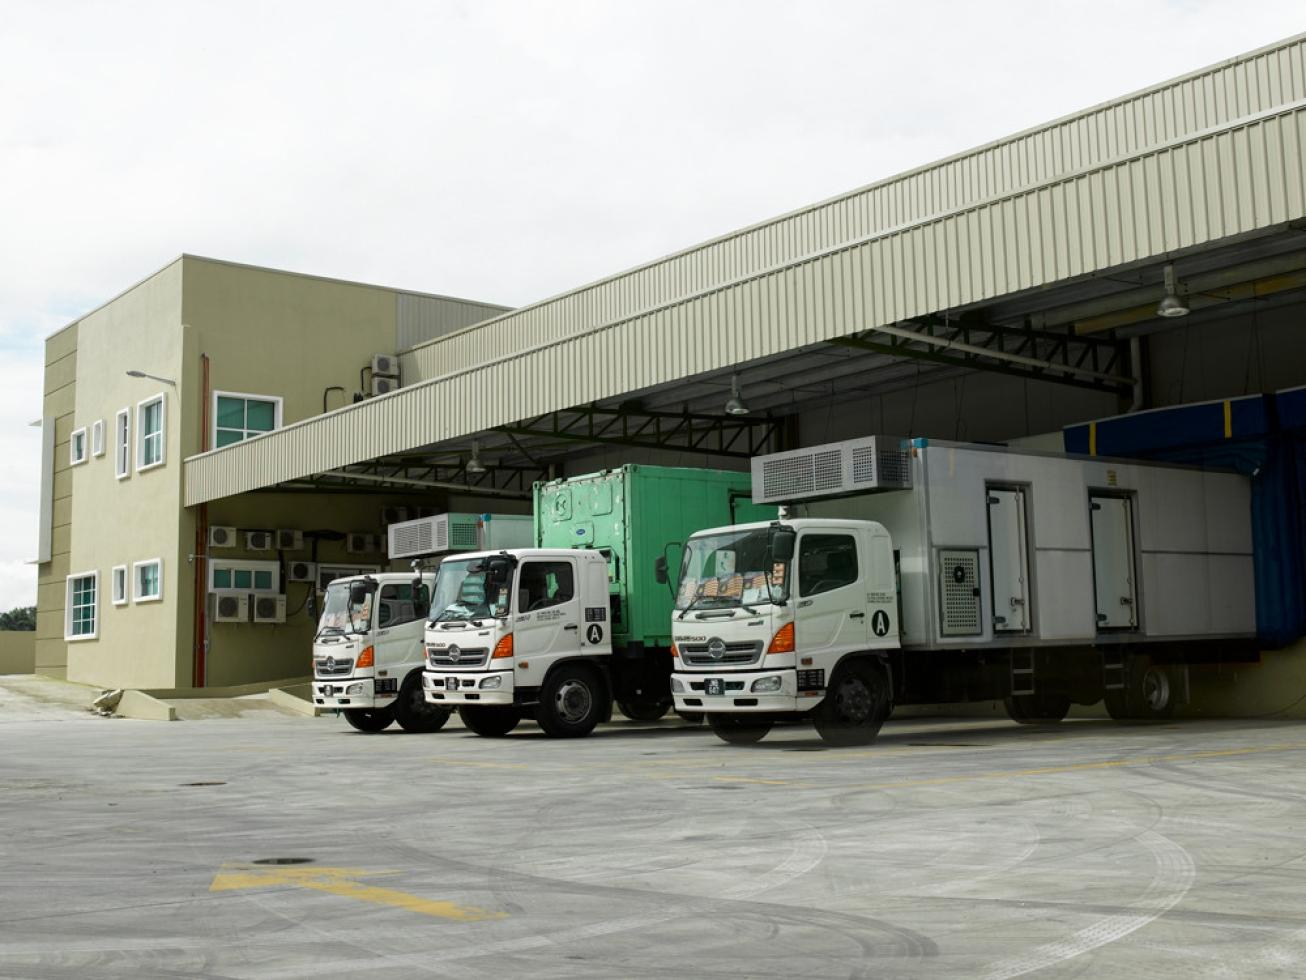 DOB (deliver on behalf) Cold Chain Warehouse Logistic Management